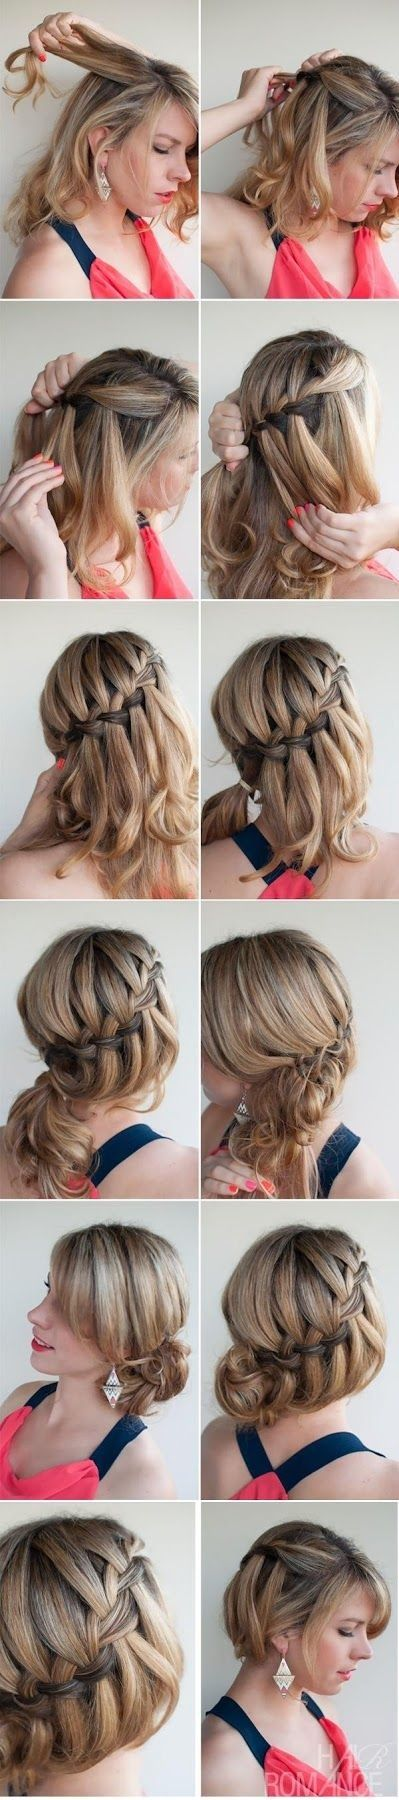 coiffure-cheveux-mi-longs-10